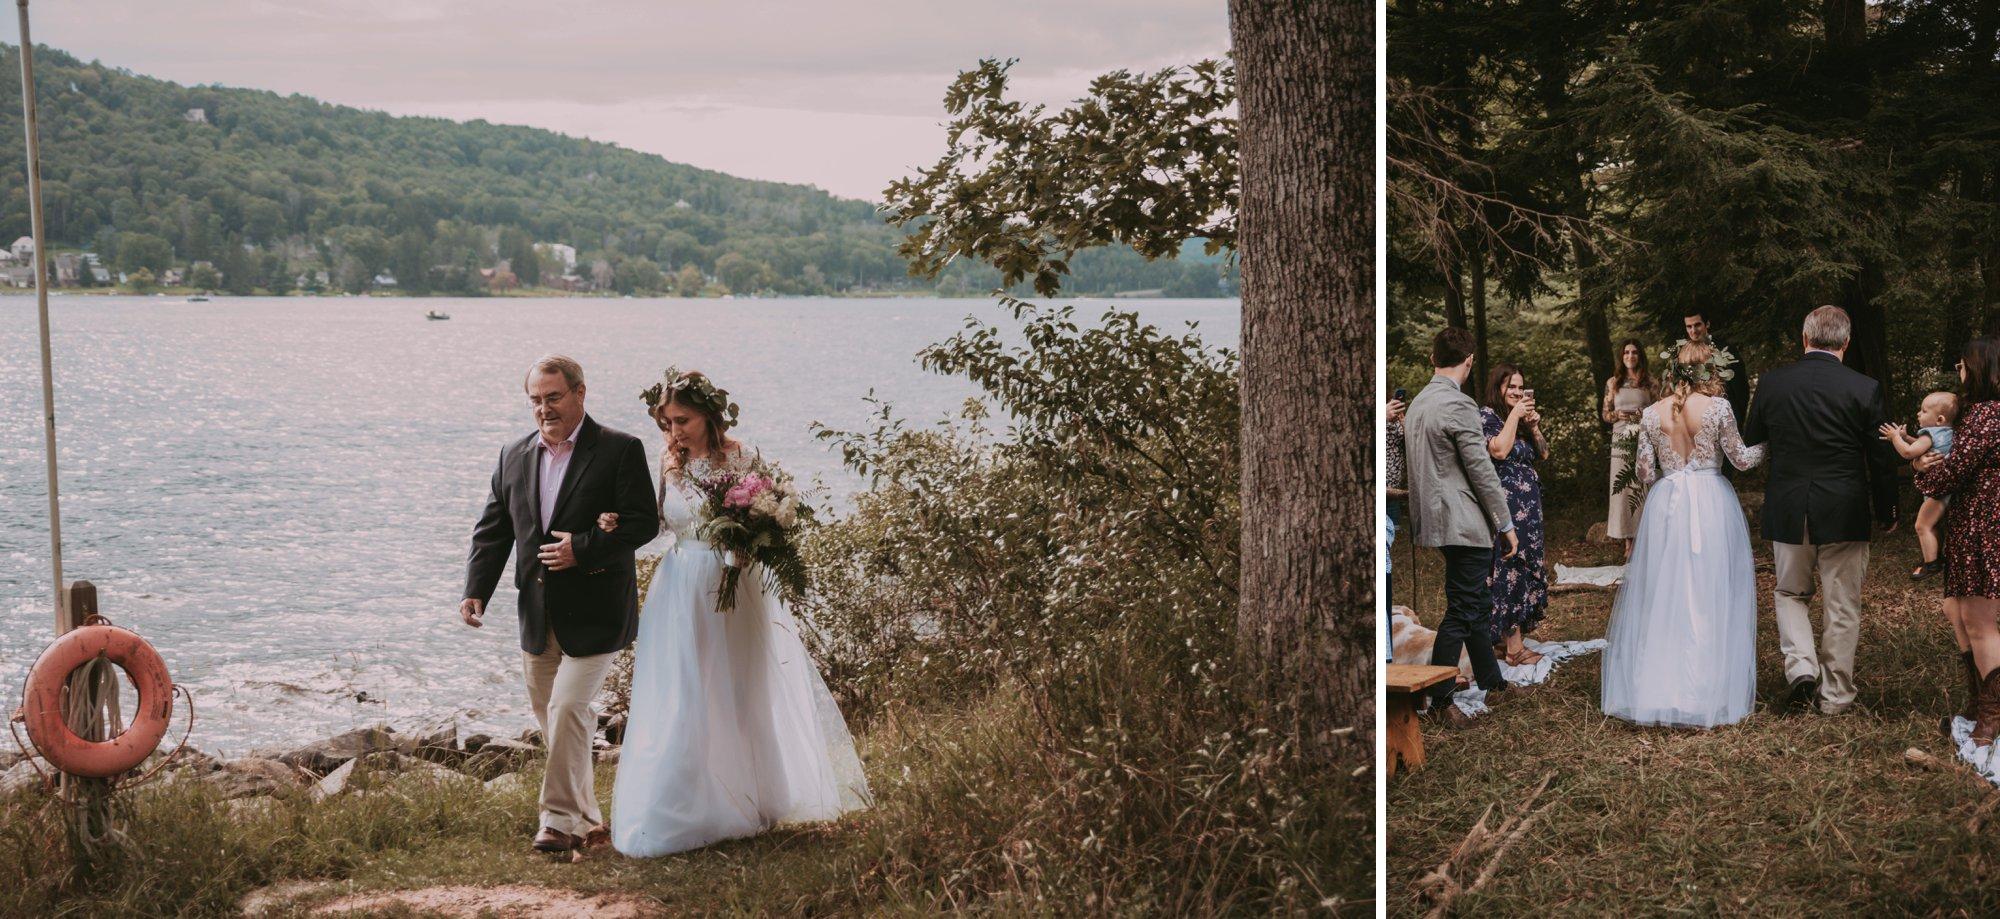 Rustic Intimate Vegan Forest Wedding with Handmade Dress. Bride Walking Down Aisle